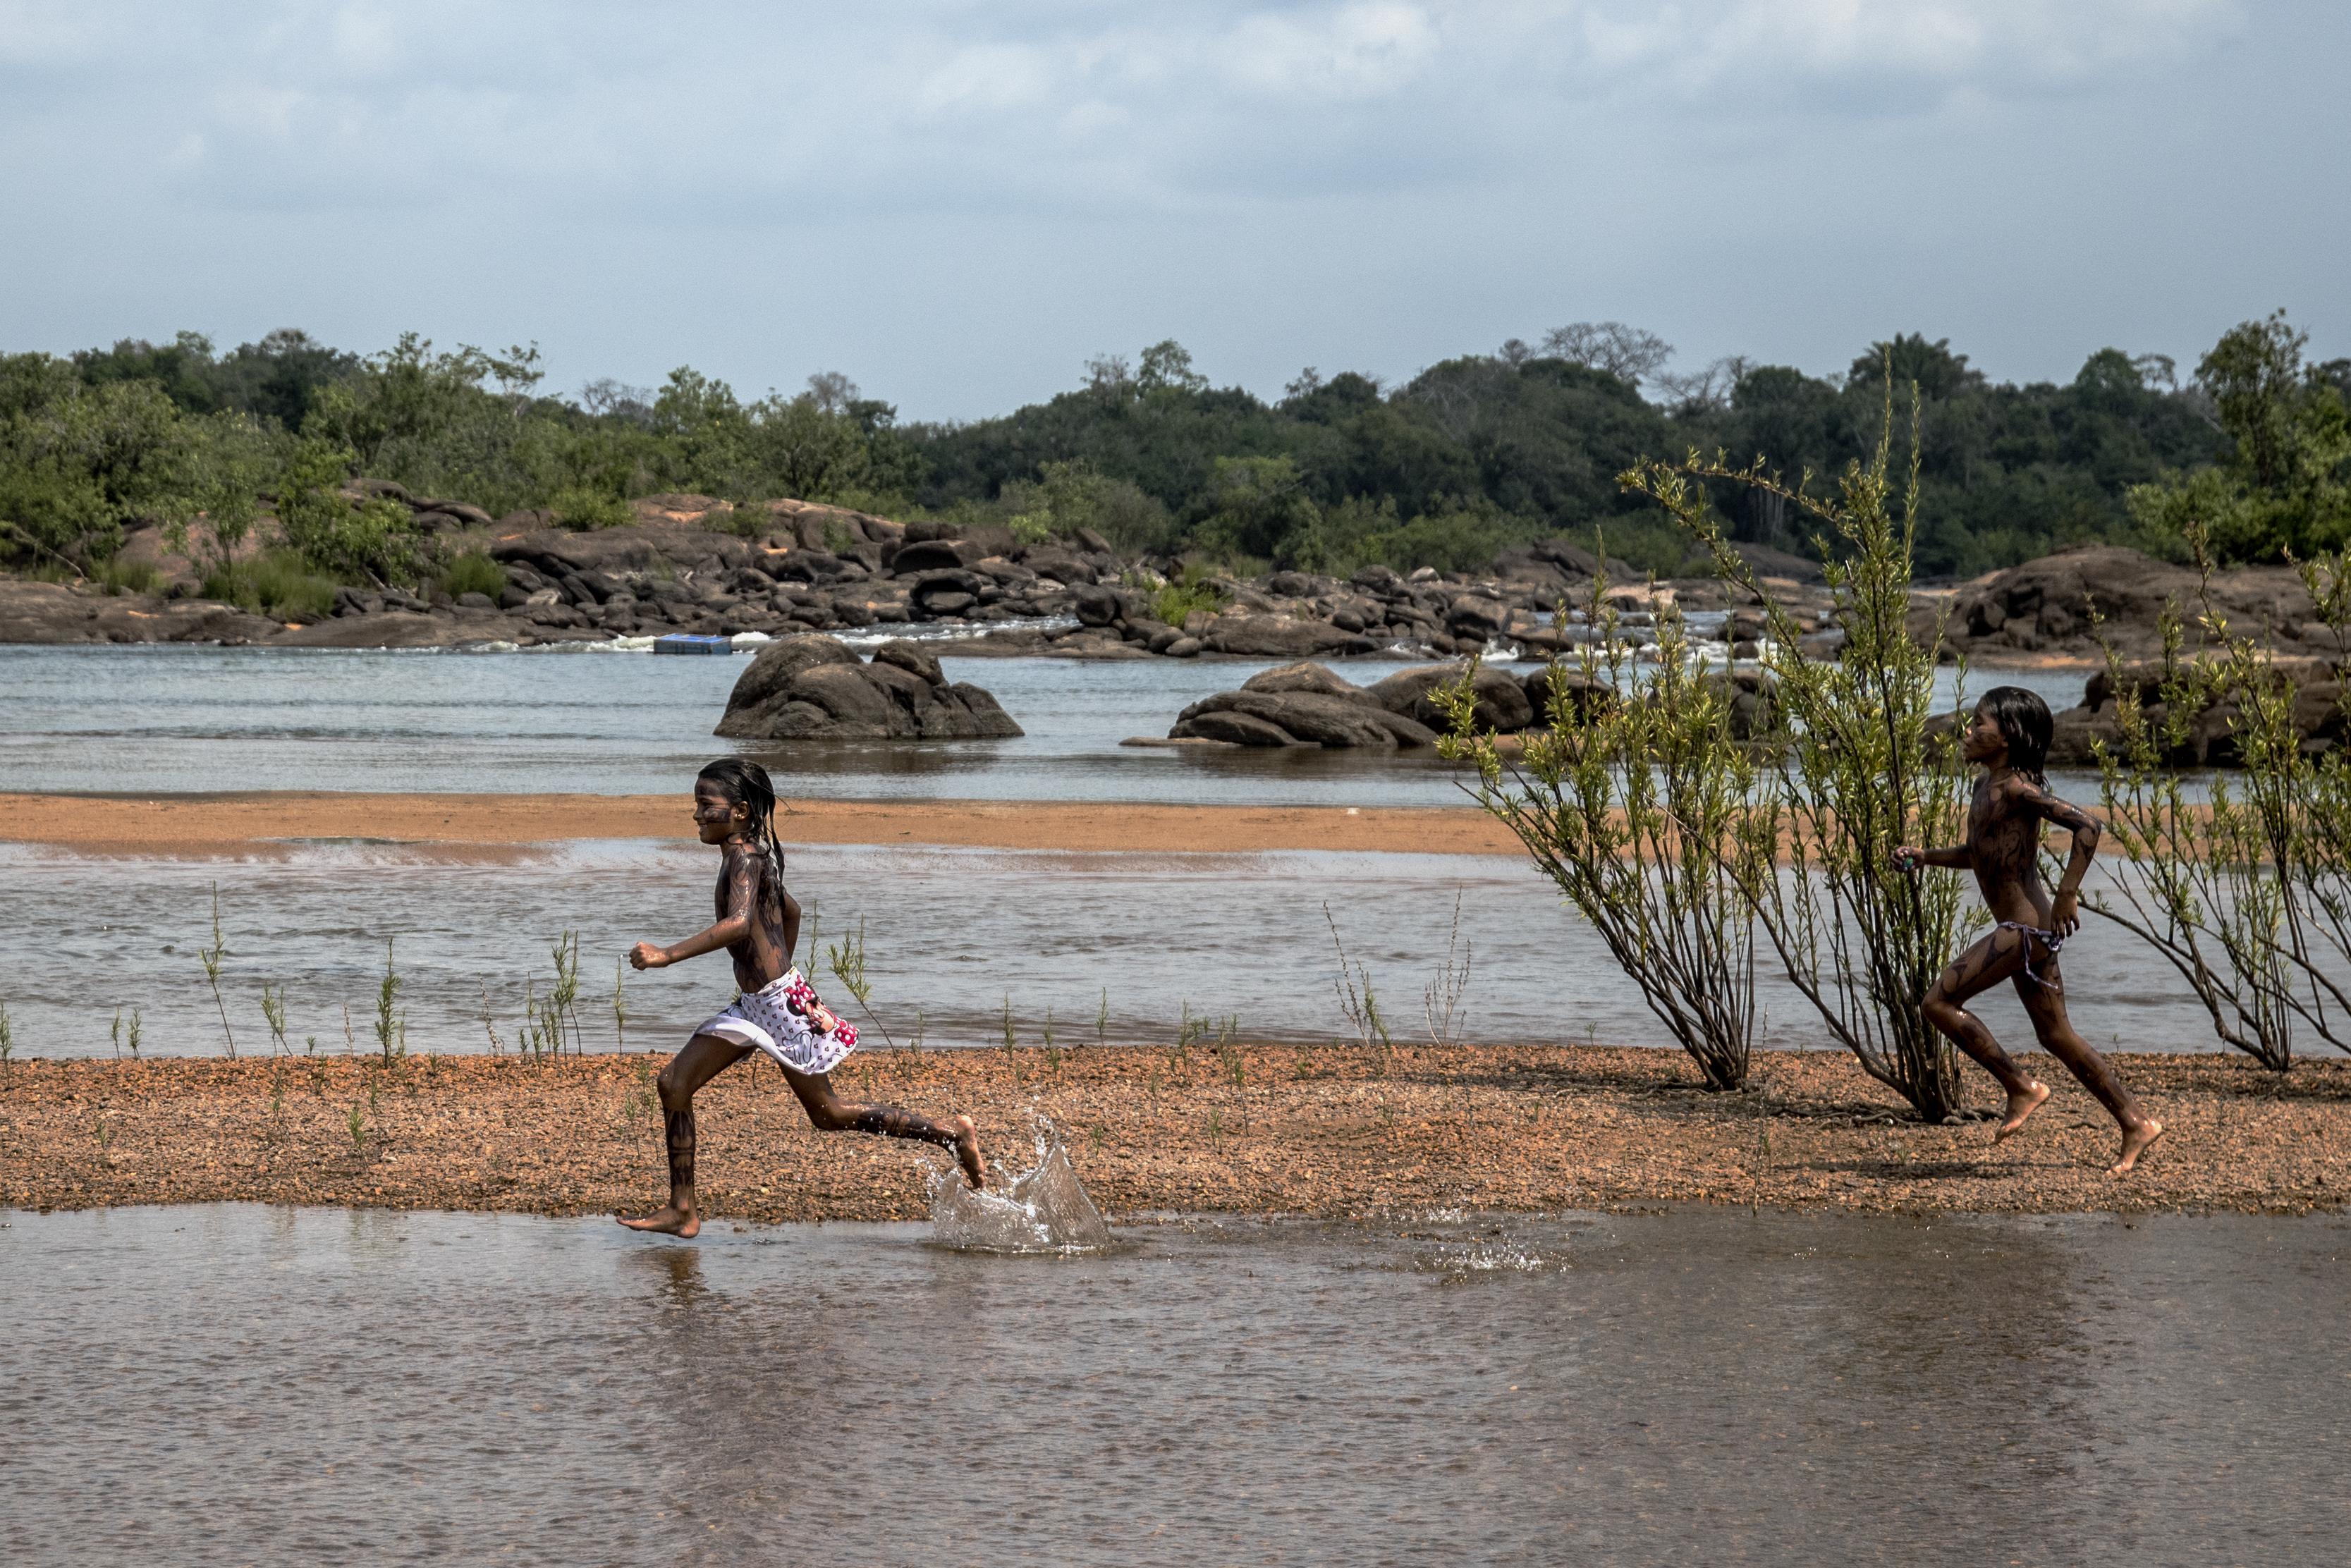 Juruna (Yudja) chidren playing at Miratu village, Big Bend of the Xingu River